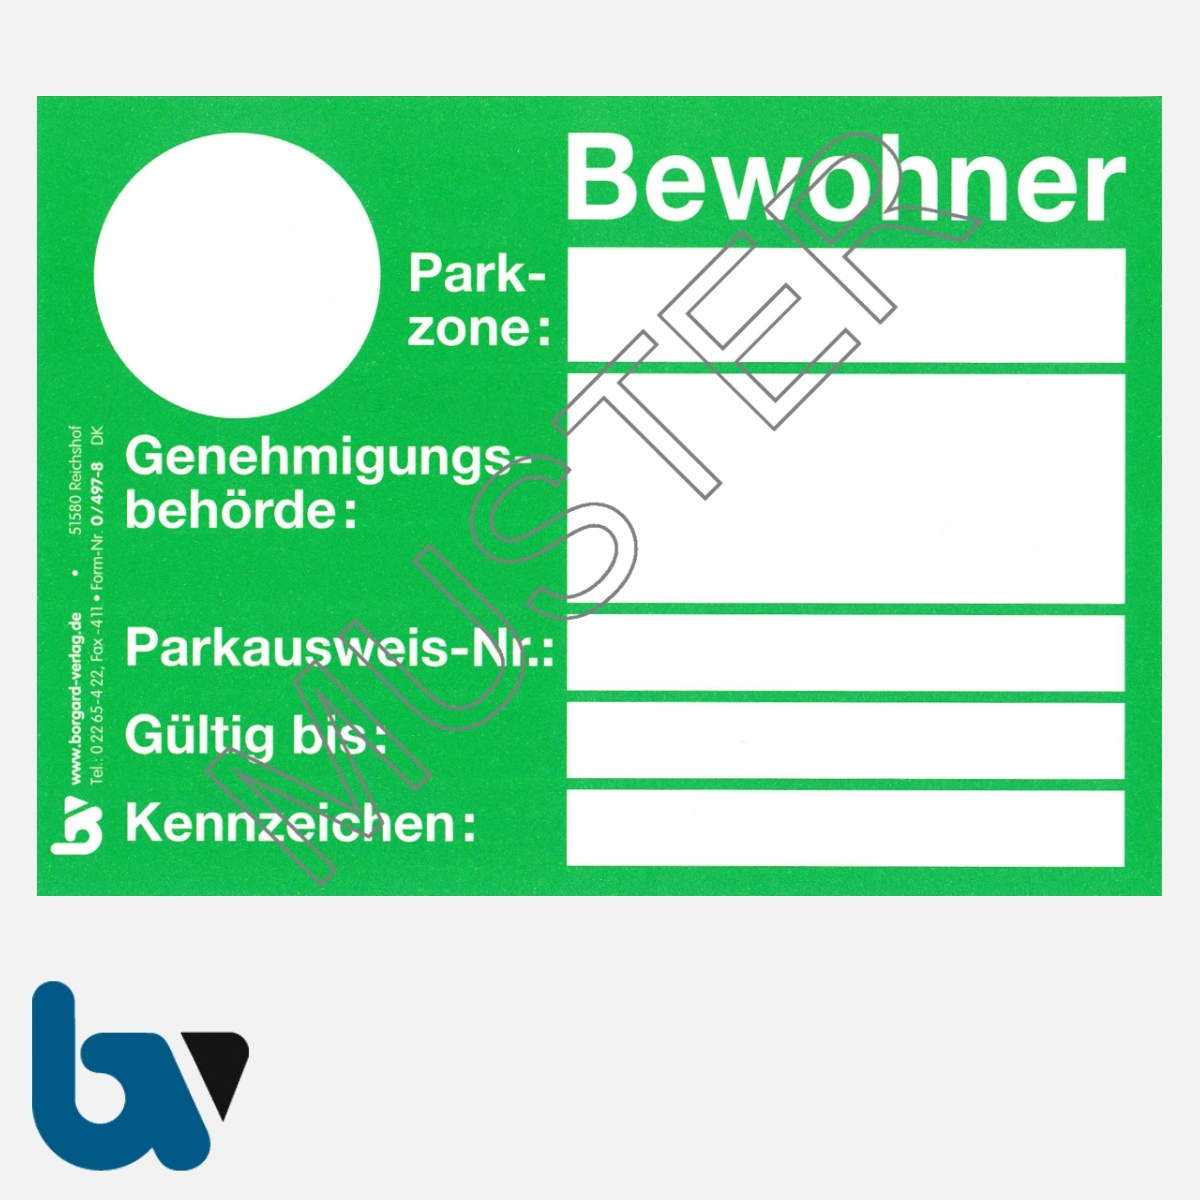 0/497-8 Bewohnerparkausweis amtlich Muster grün DIN A6 Karton VS   Borgard Verlag GmbH